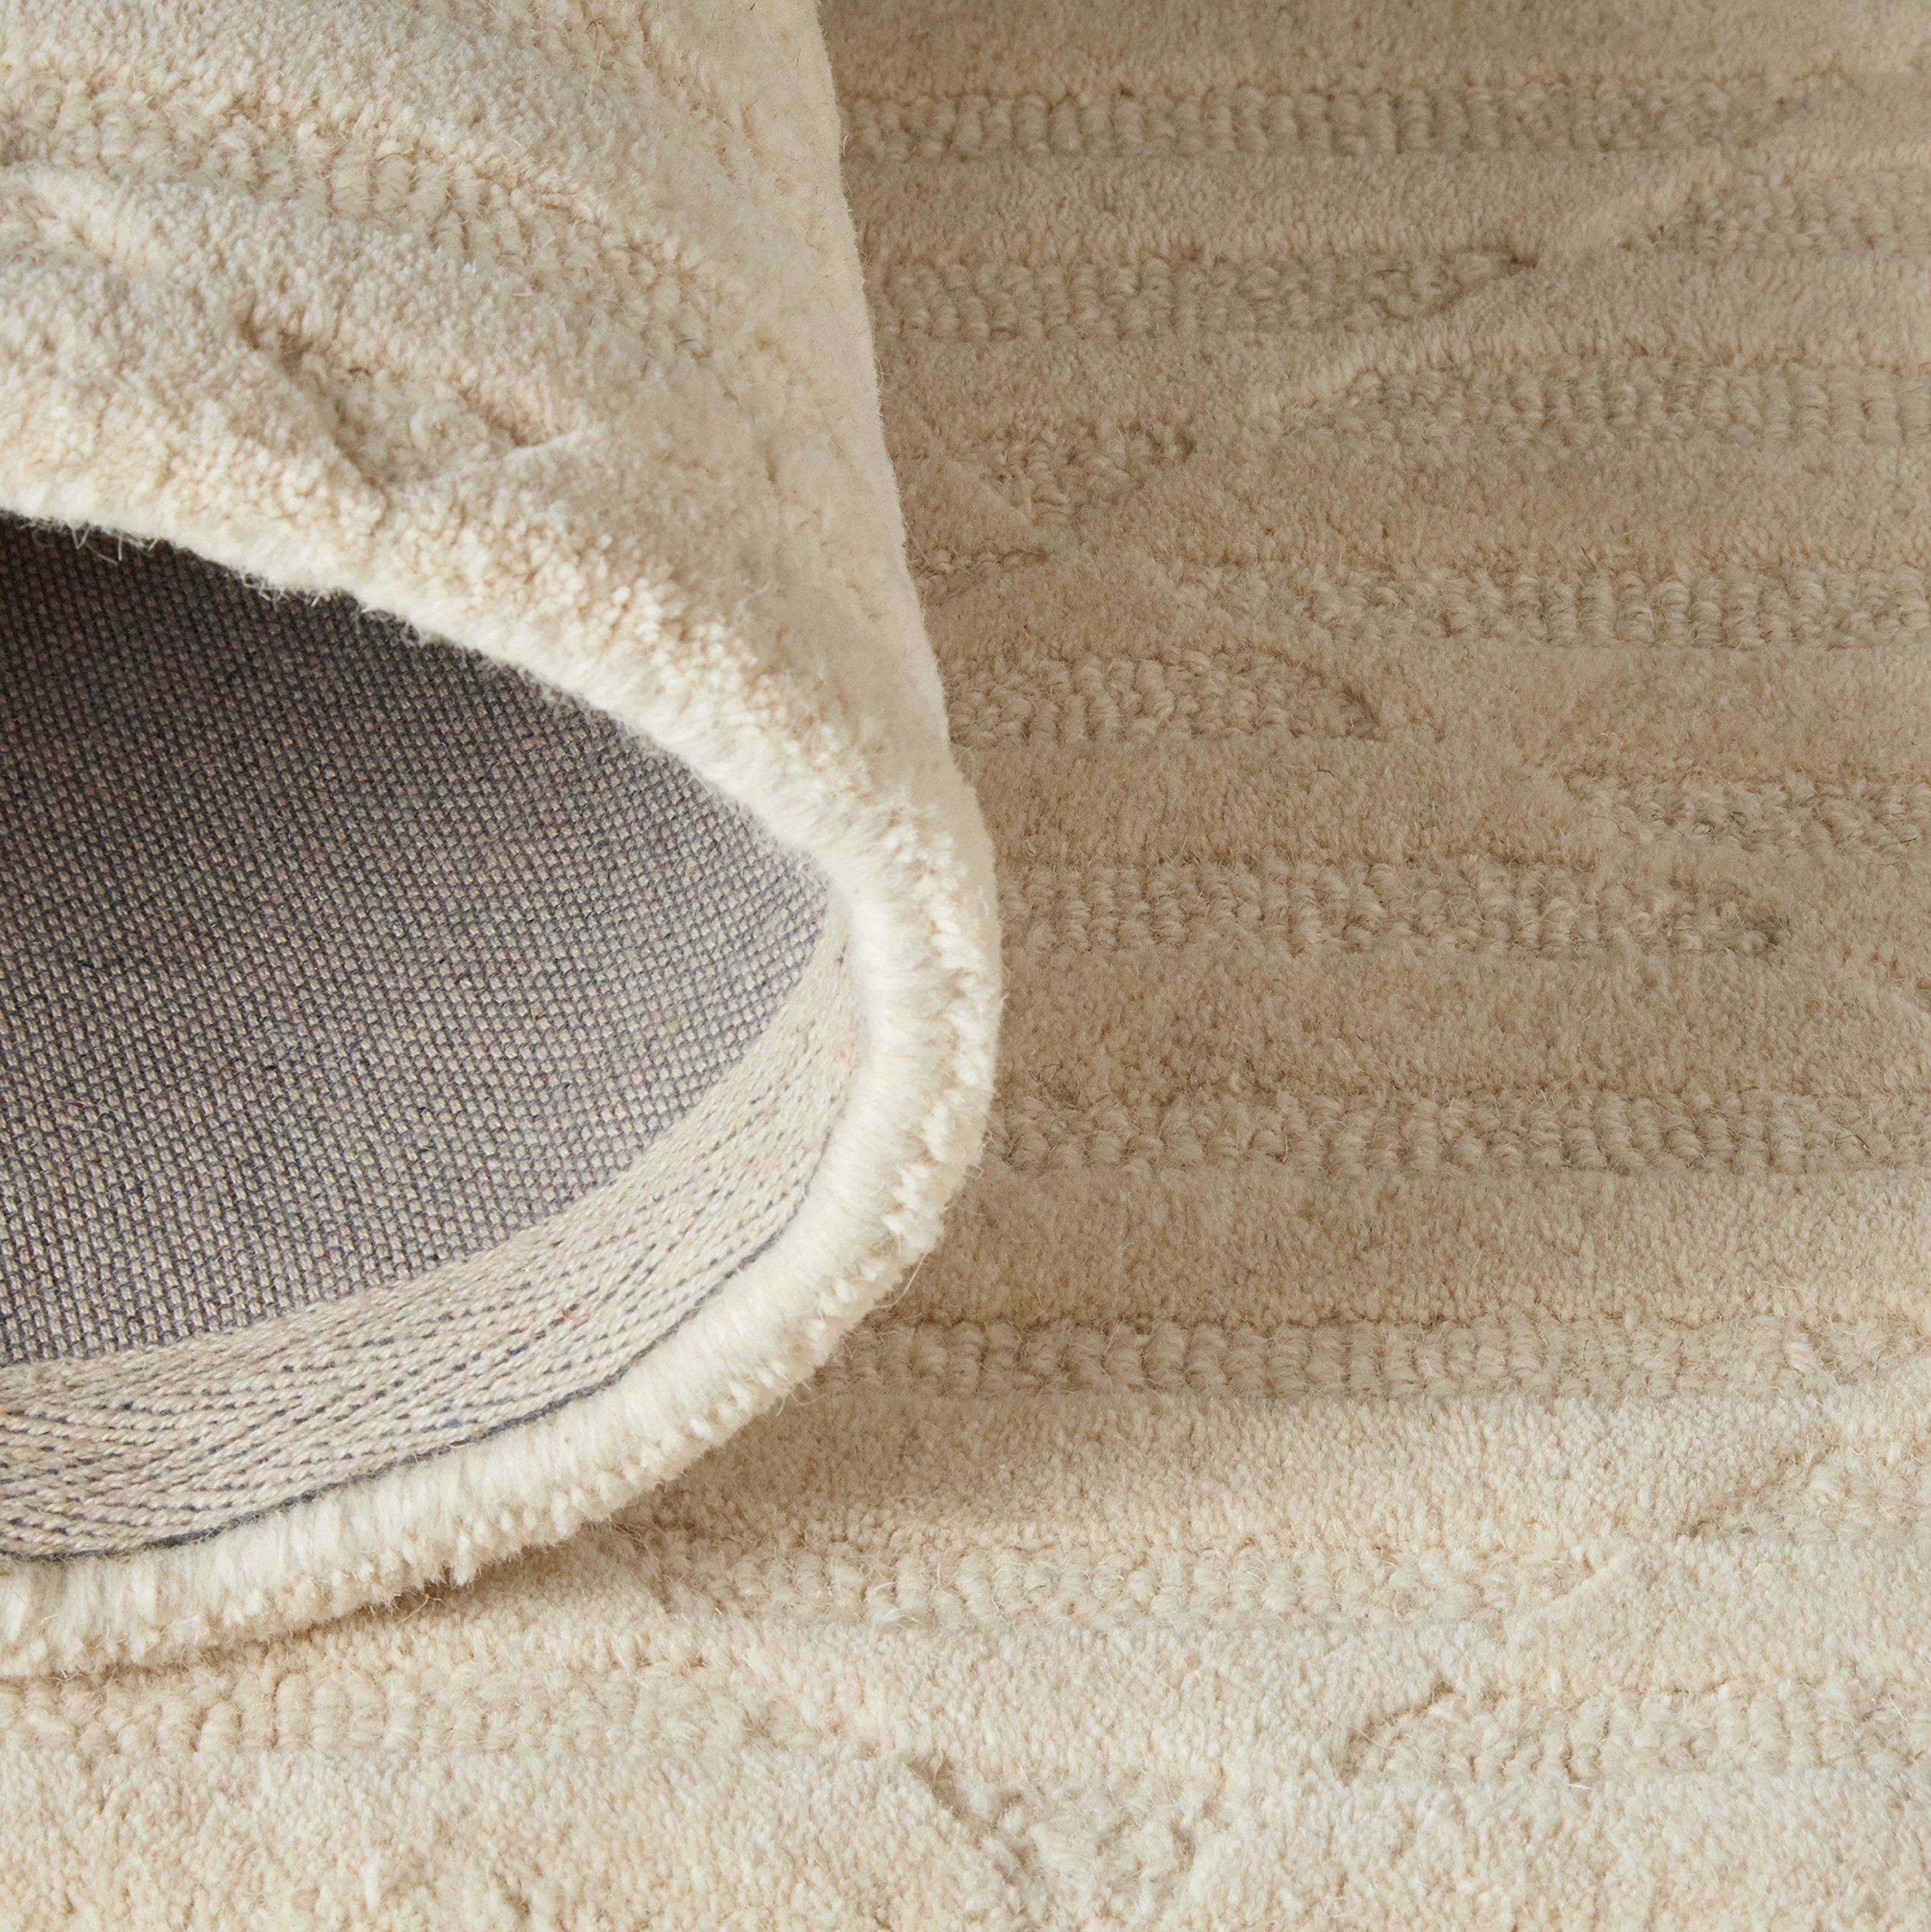 Rivet Geometric Criss-Cross Woven Wool Area Rug, 8' x 10', Cream by Rivet (Image #5)